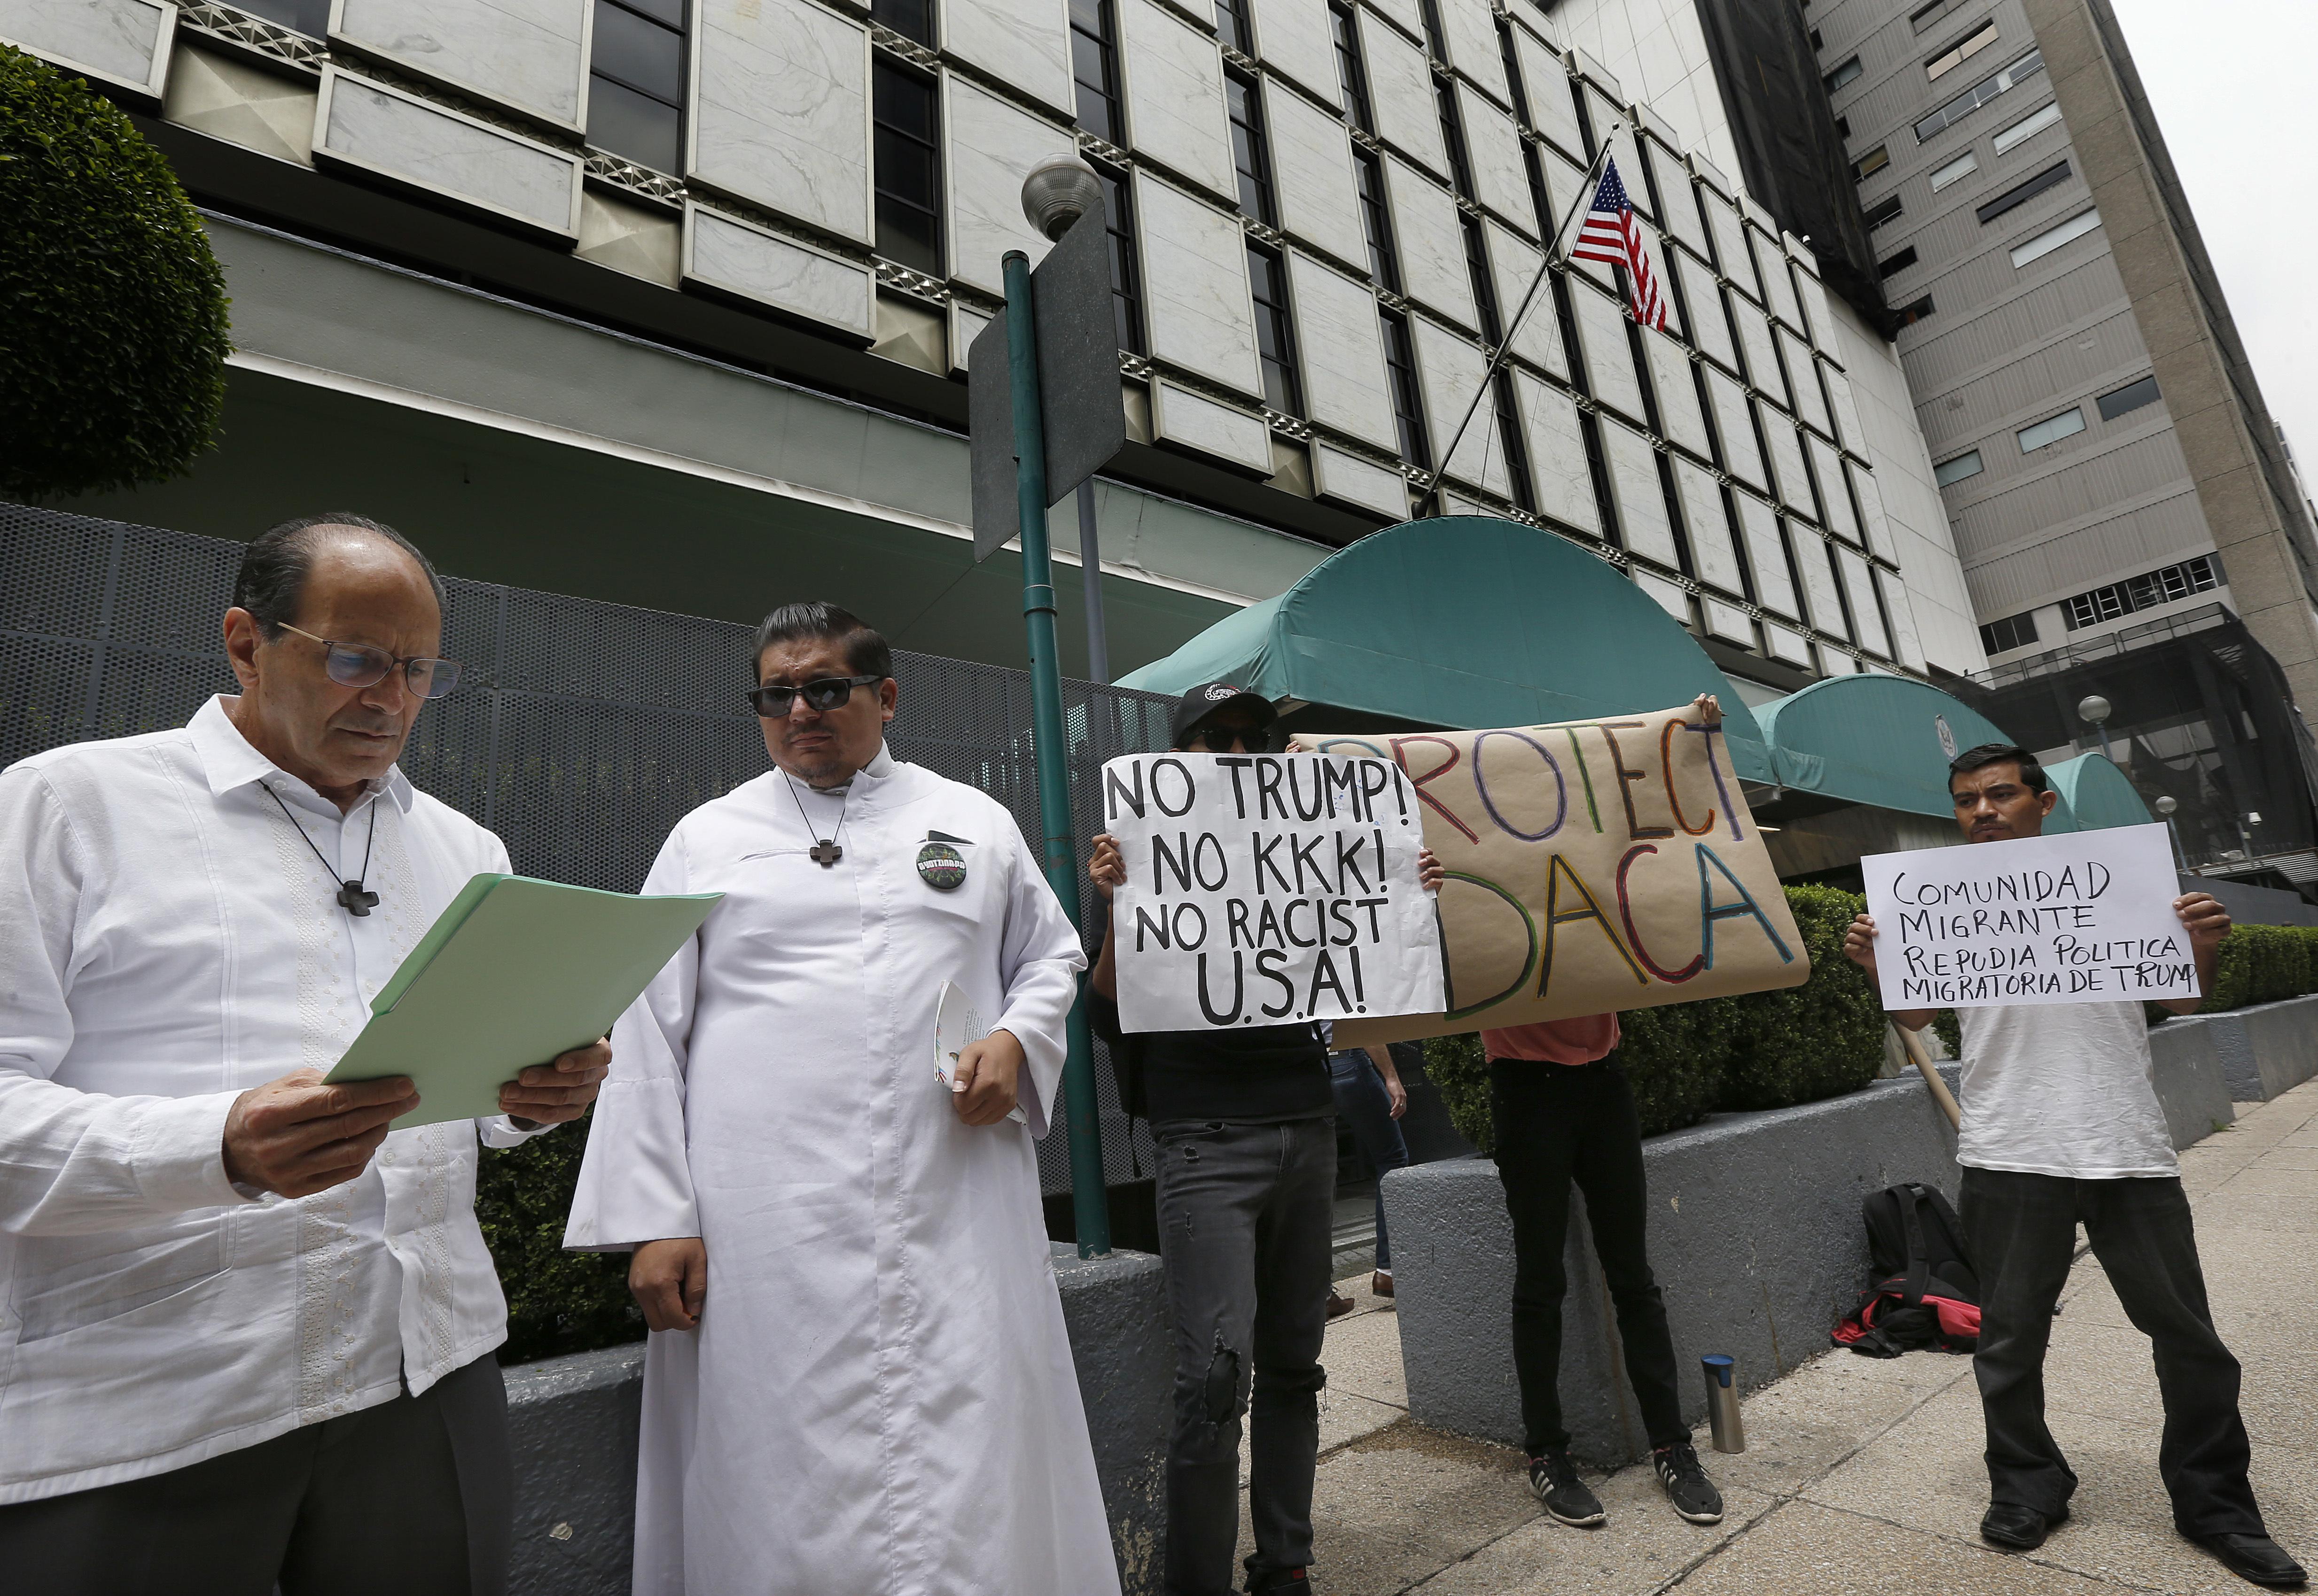 Plan to cancel DACA puts Mexico on alert   The Spokesman-Review